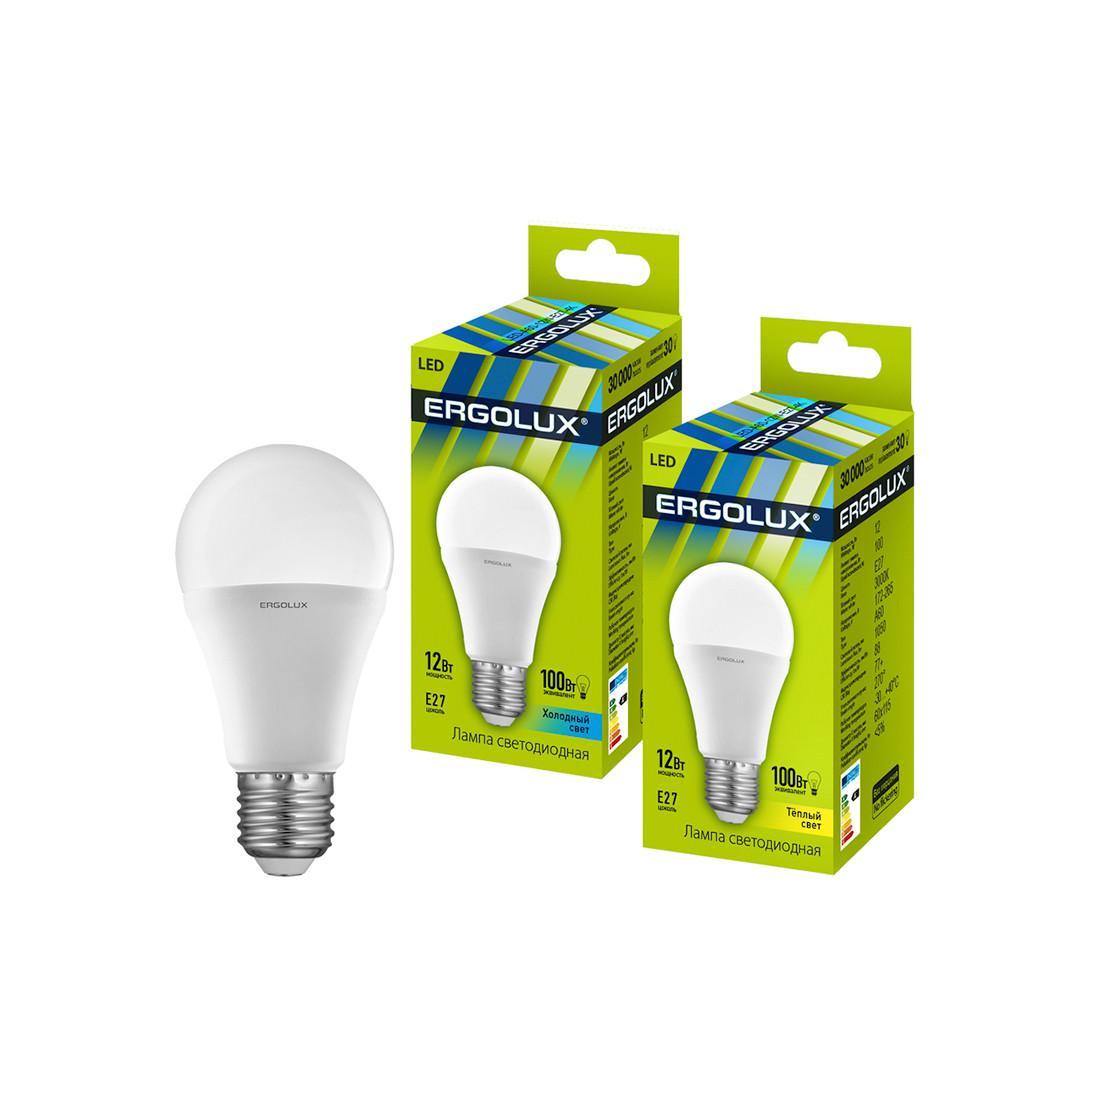 Эл. лампа светодиодная Ergolux LED-A60-12W-E27-3K, Тёплый